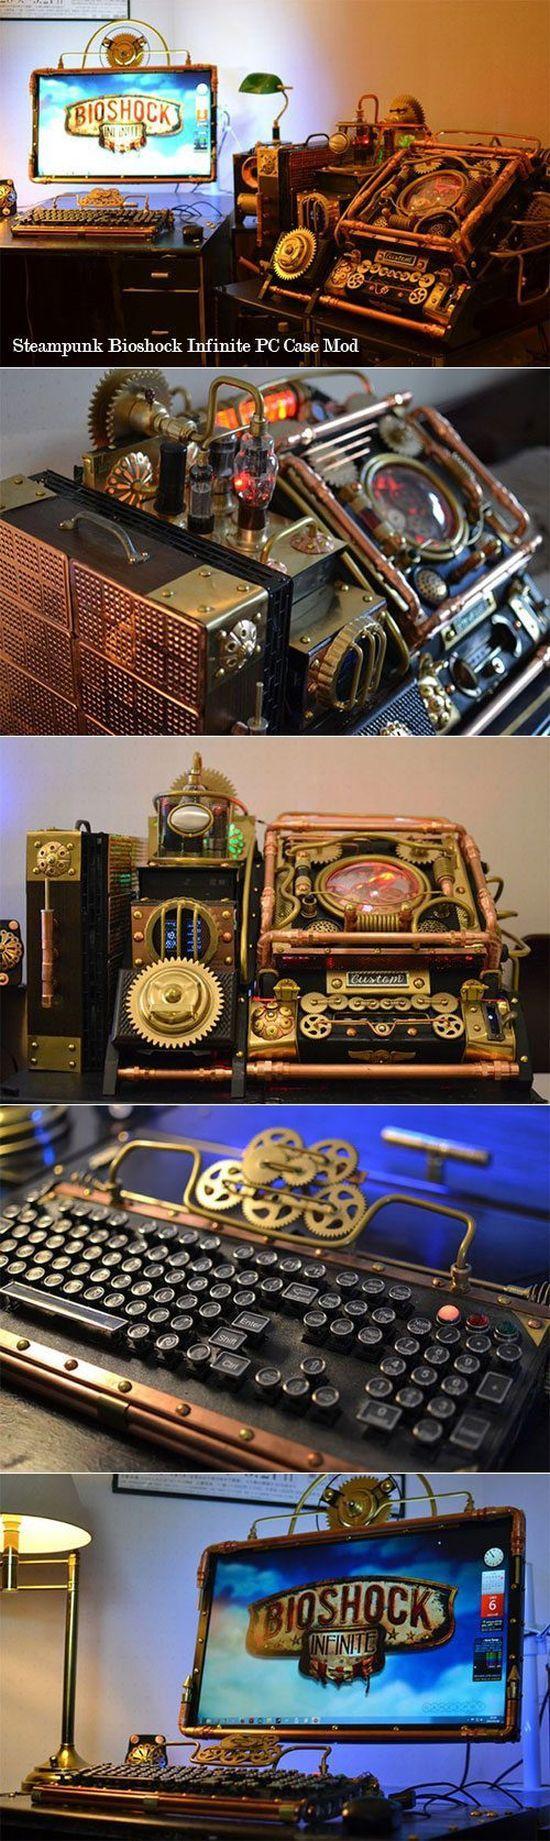 steampunk bioshock mod pc case